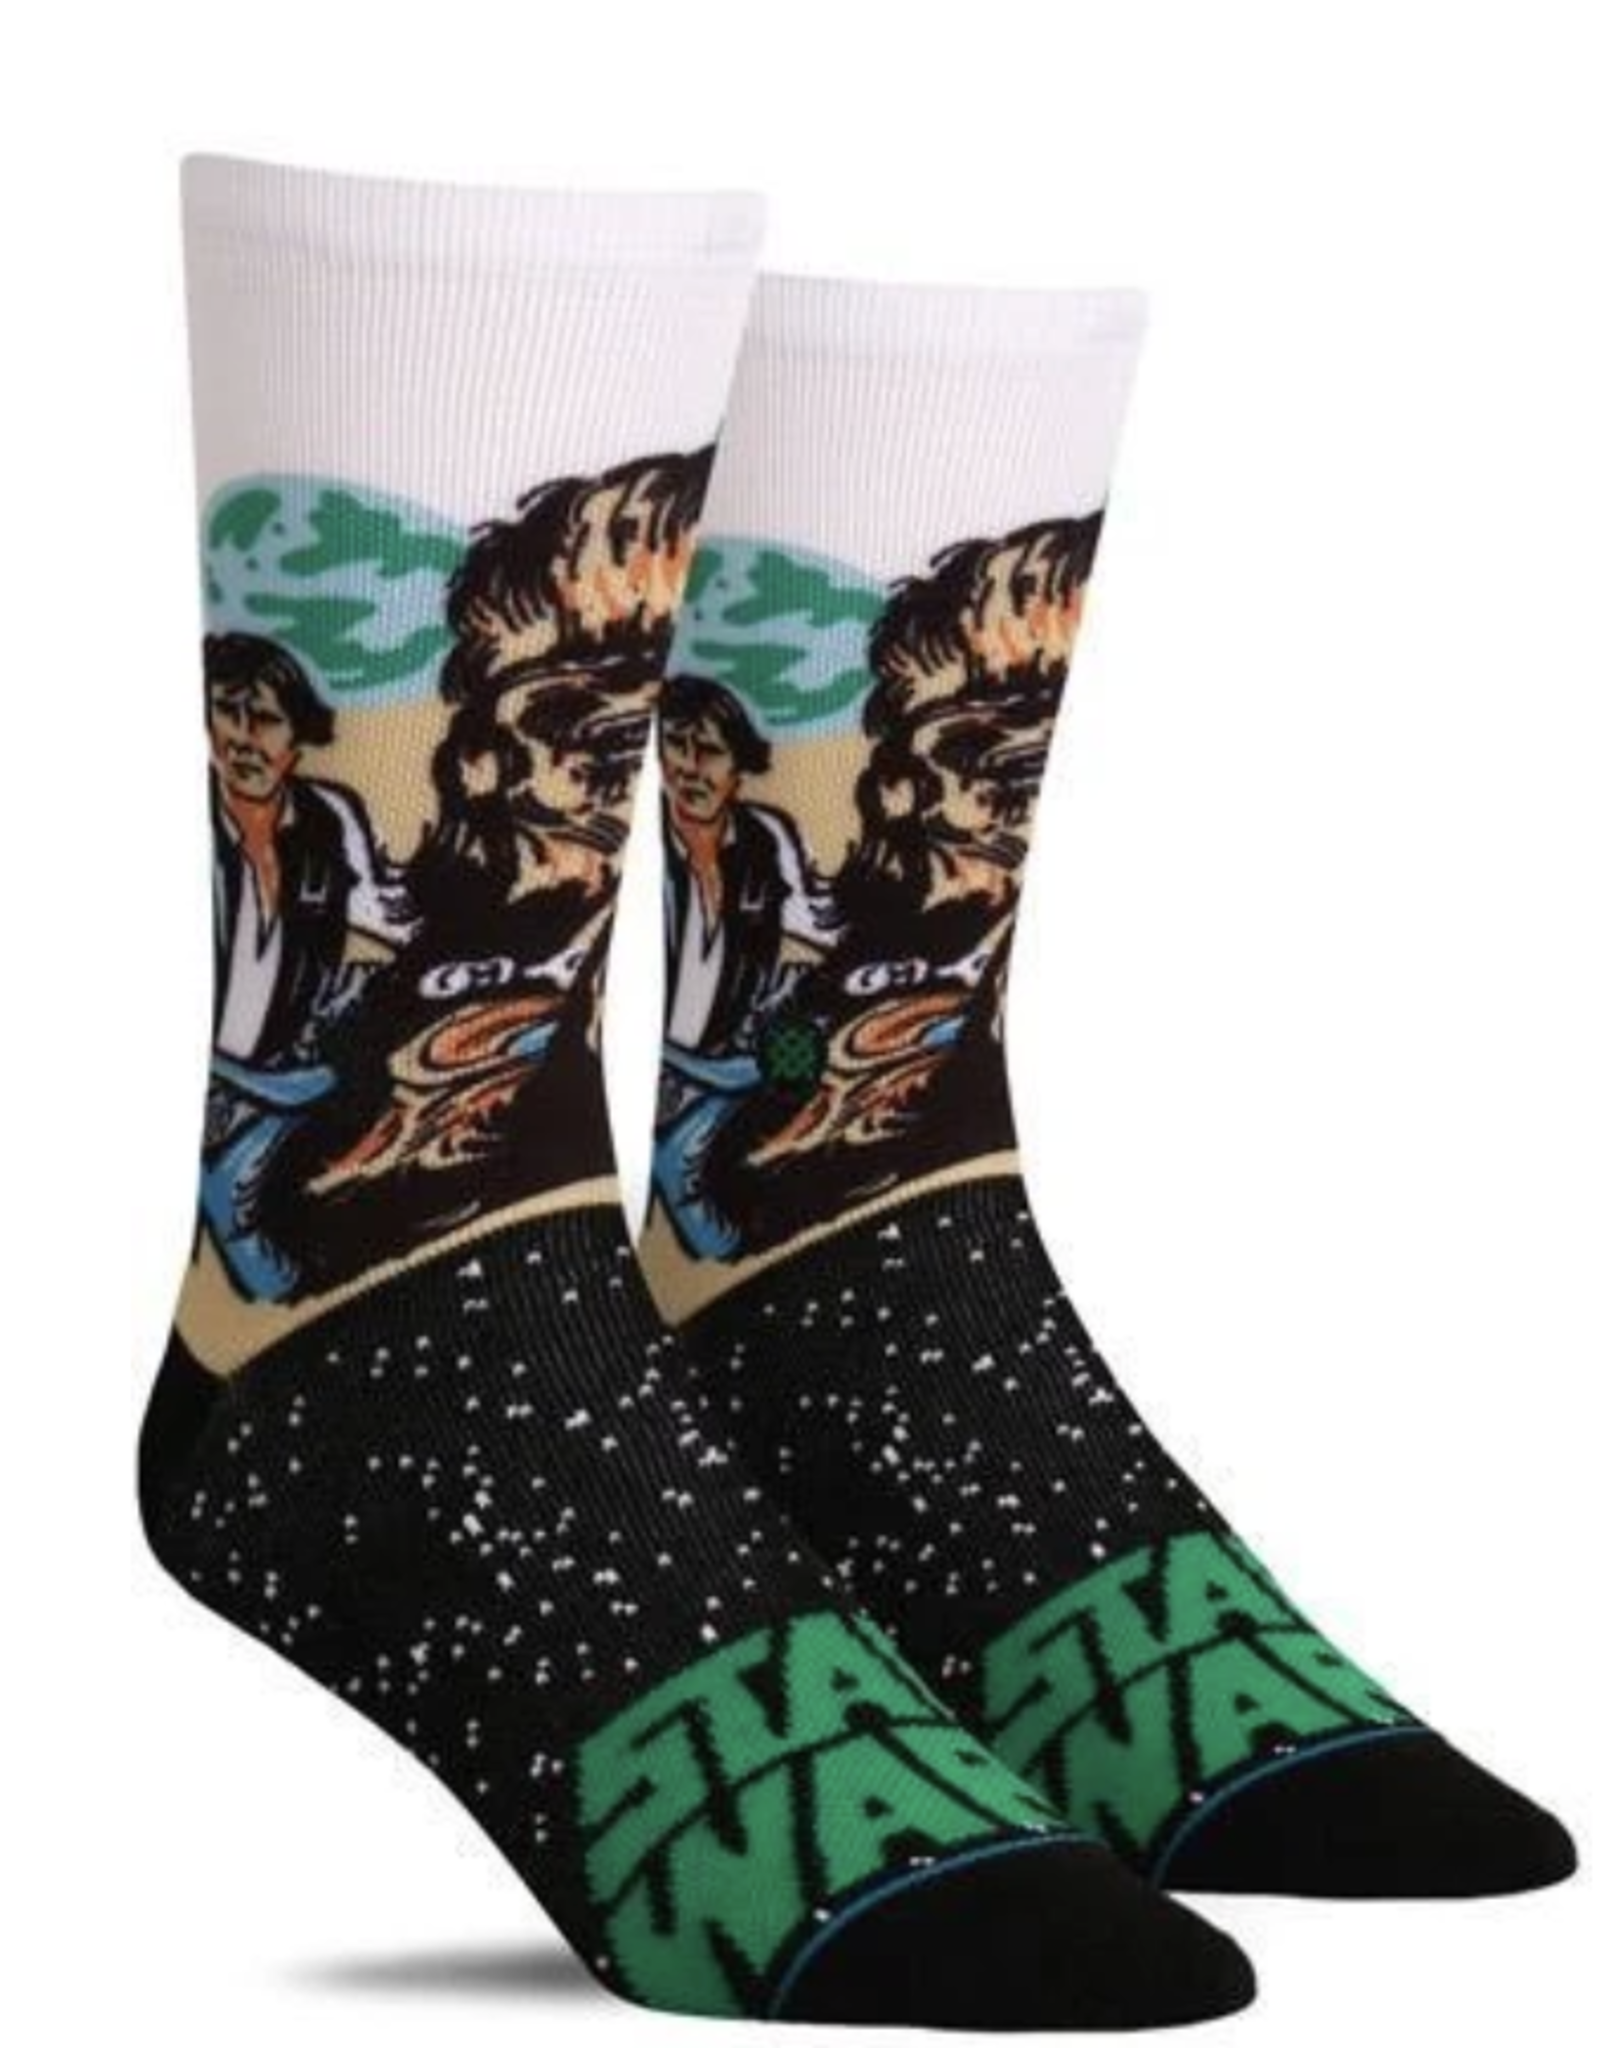 STANCE - Chewbacca Socks